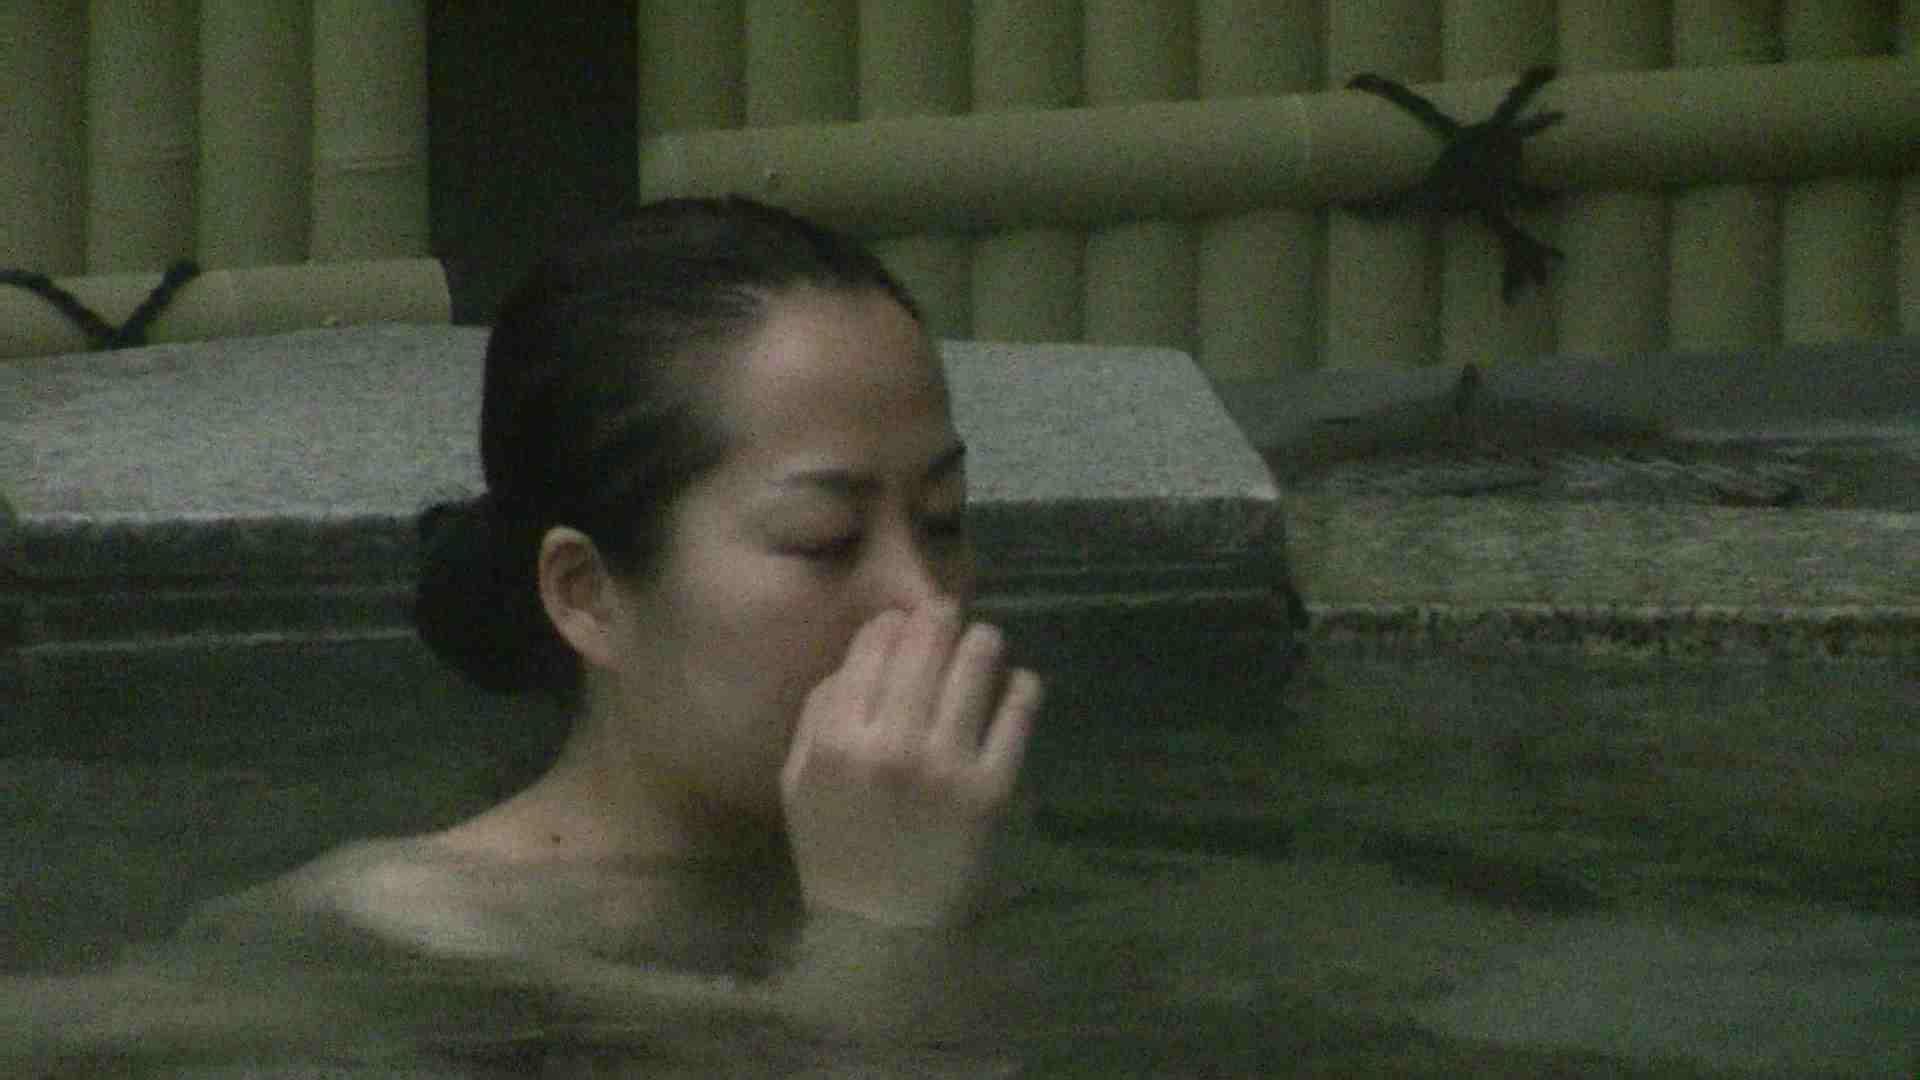 Aquaな露天風呂Vol.539 OL女体  88連発 75